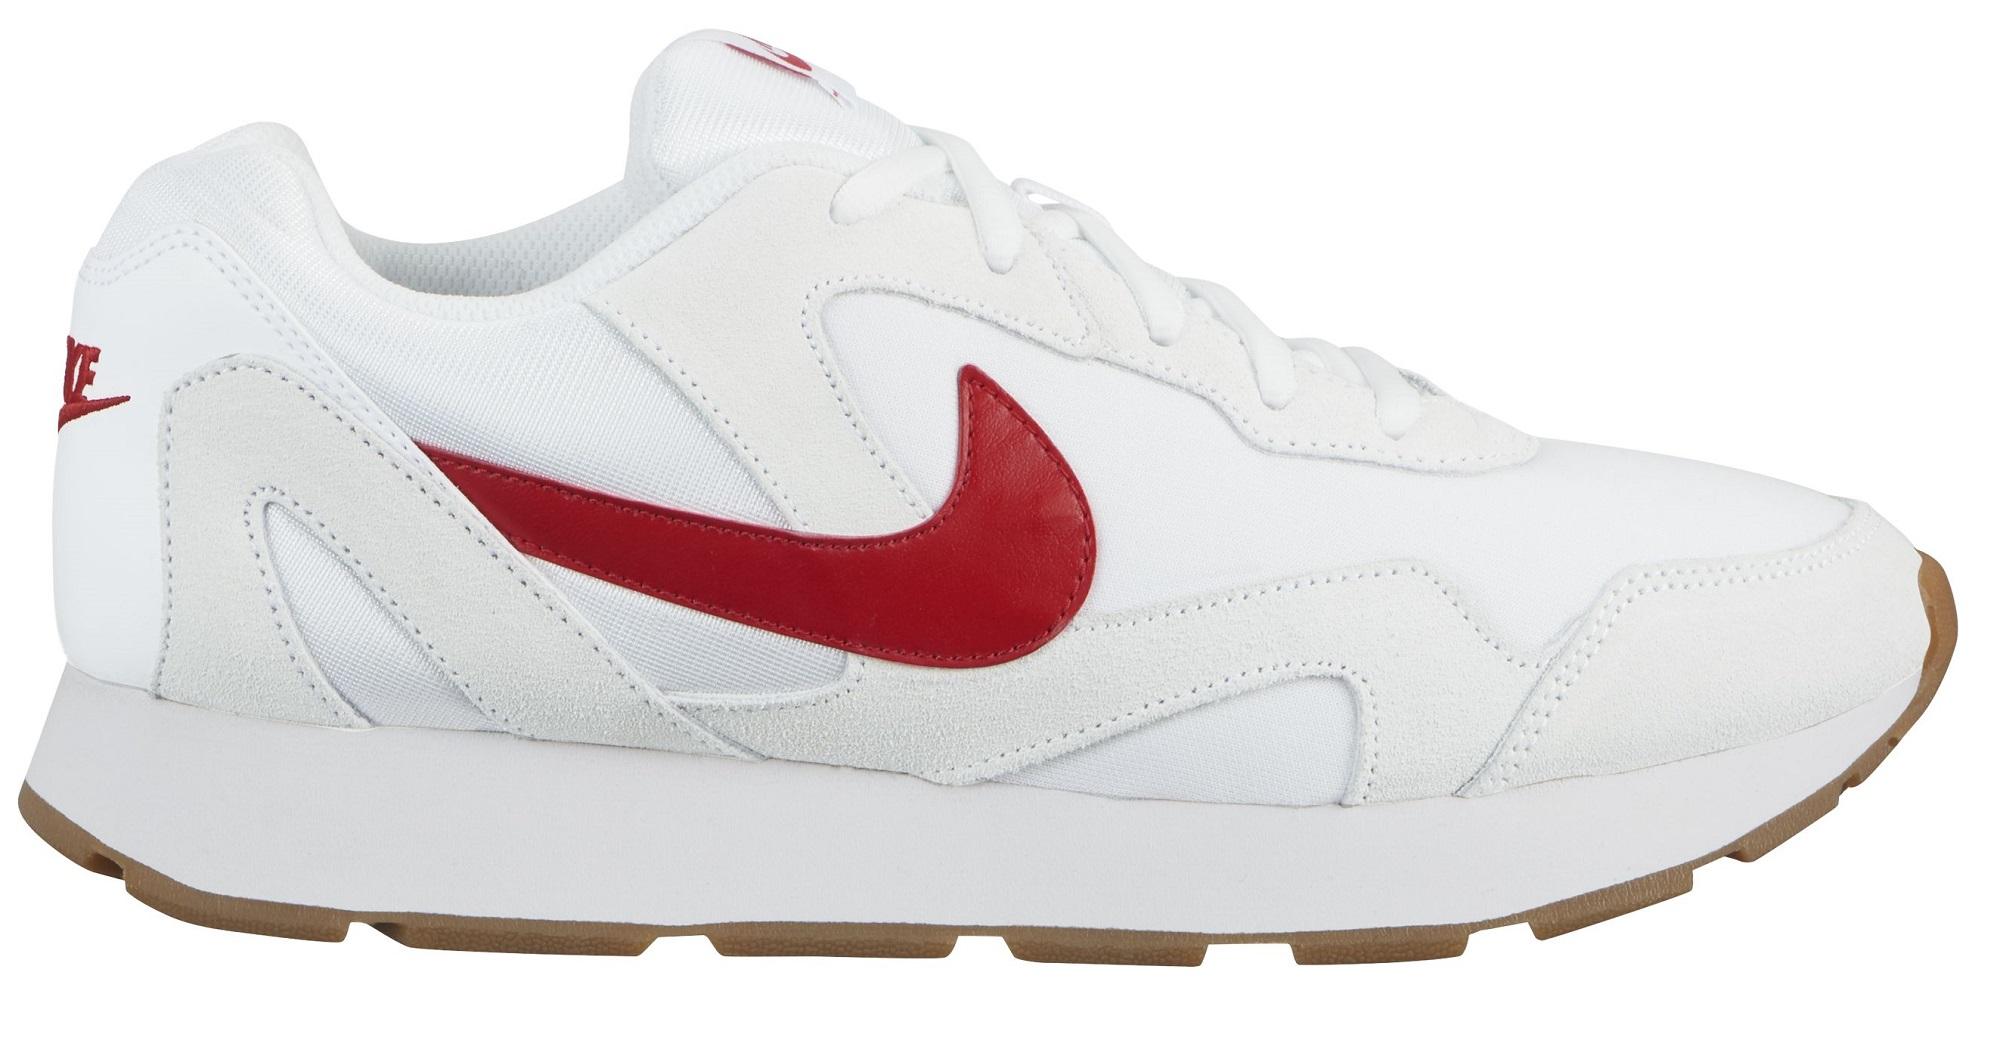 Nike Кроссовки мужские Nike Delfine, размер 39,5